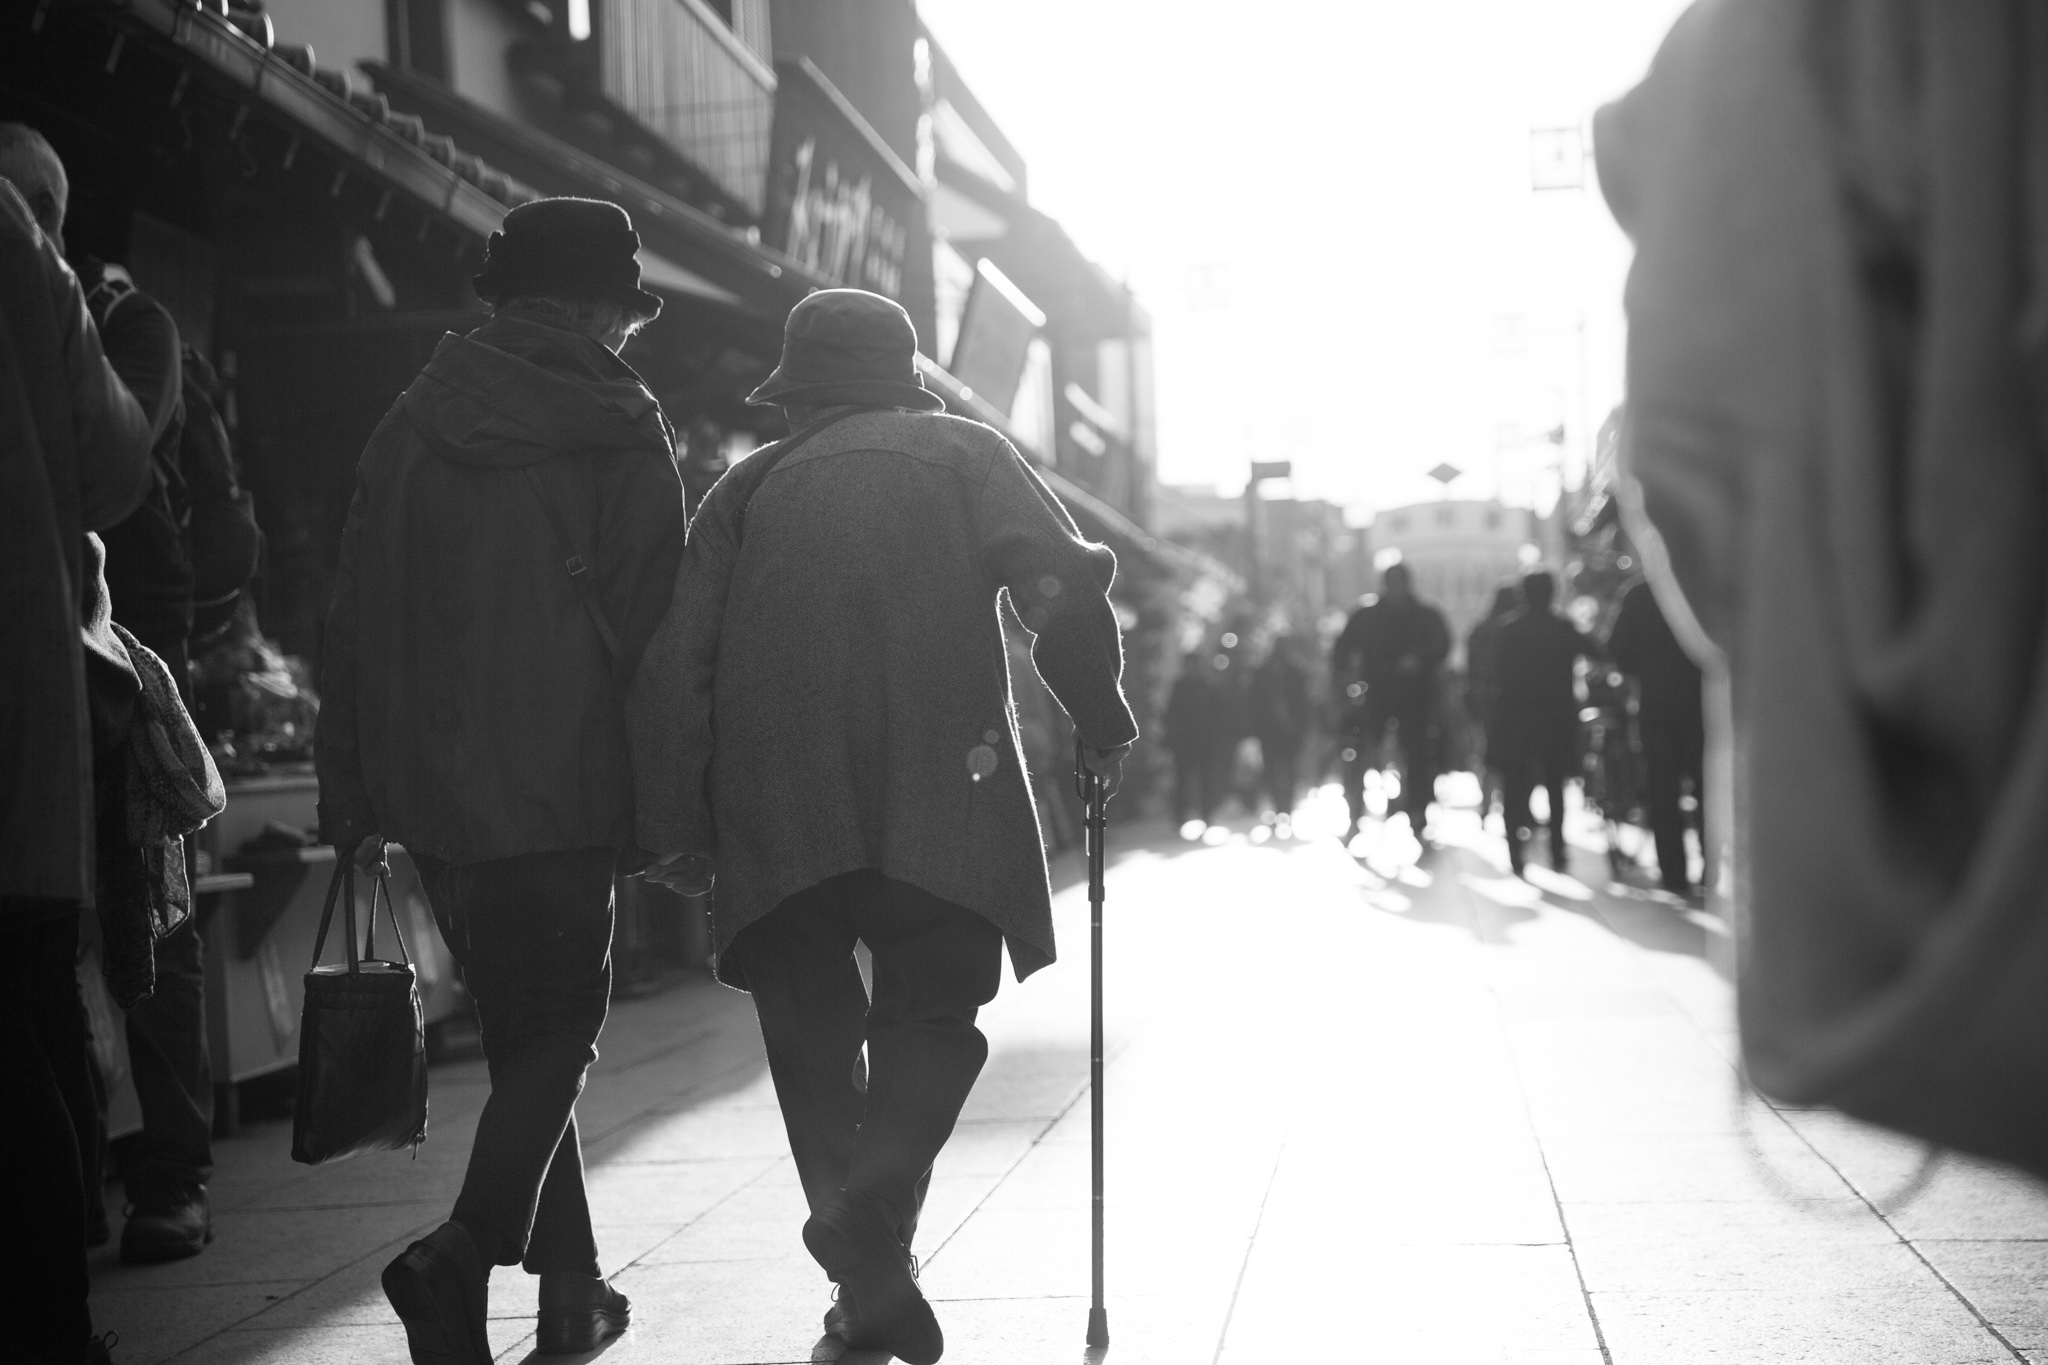 6084-japan-street-black-and-white.jpg